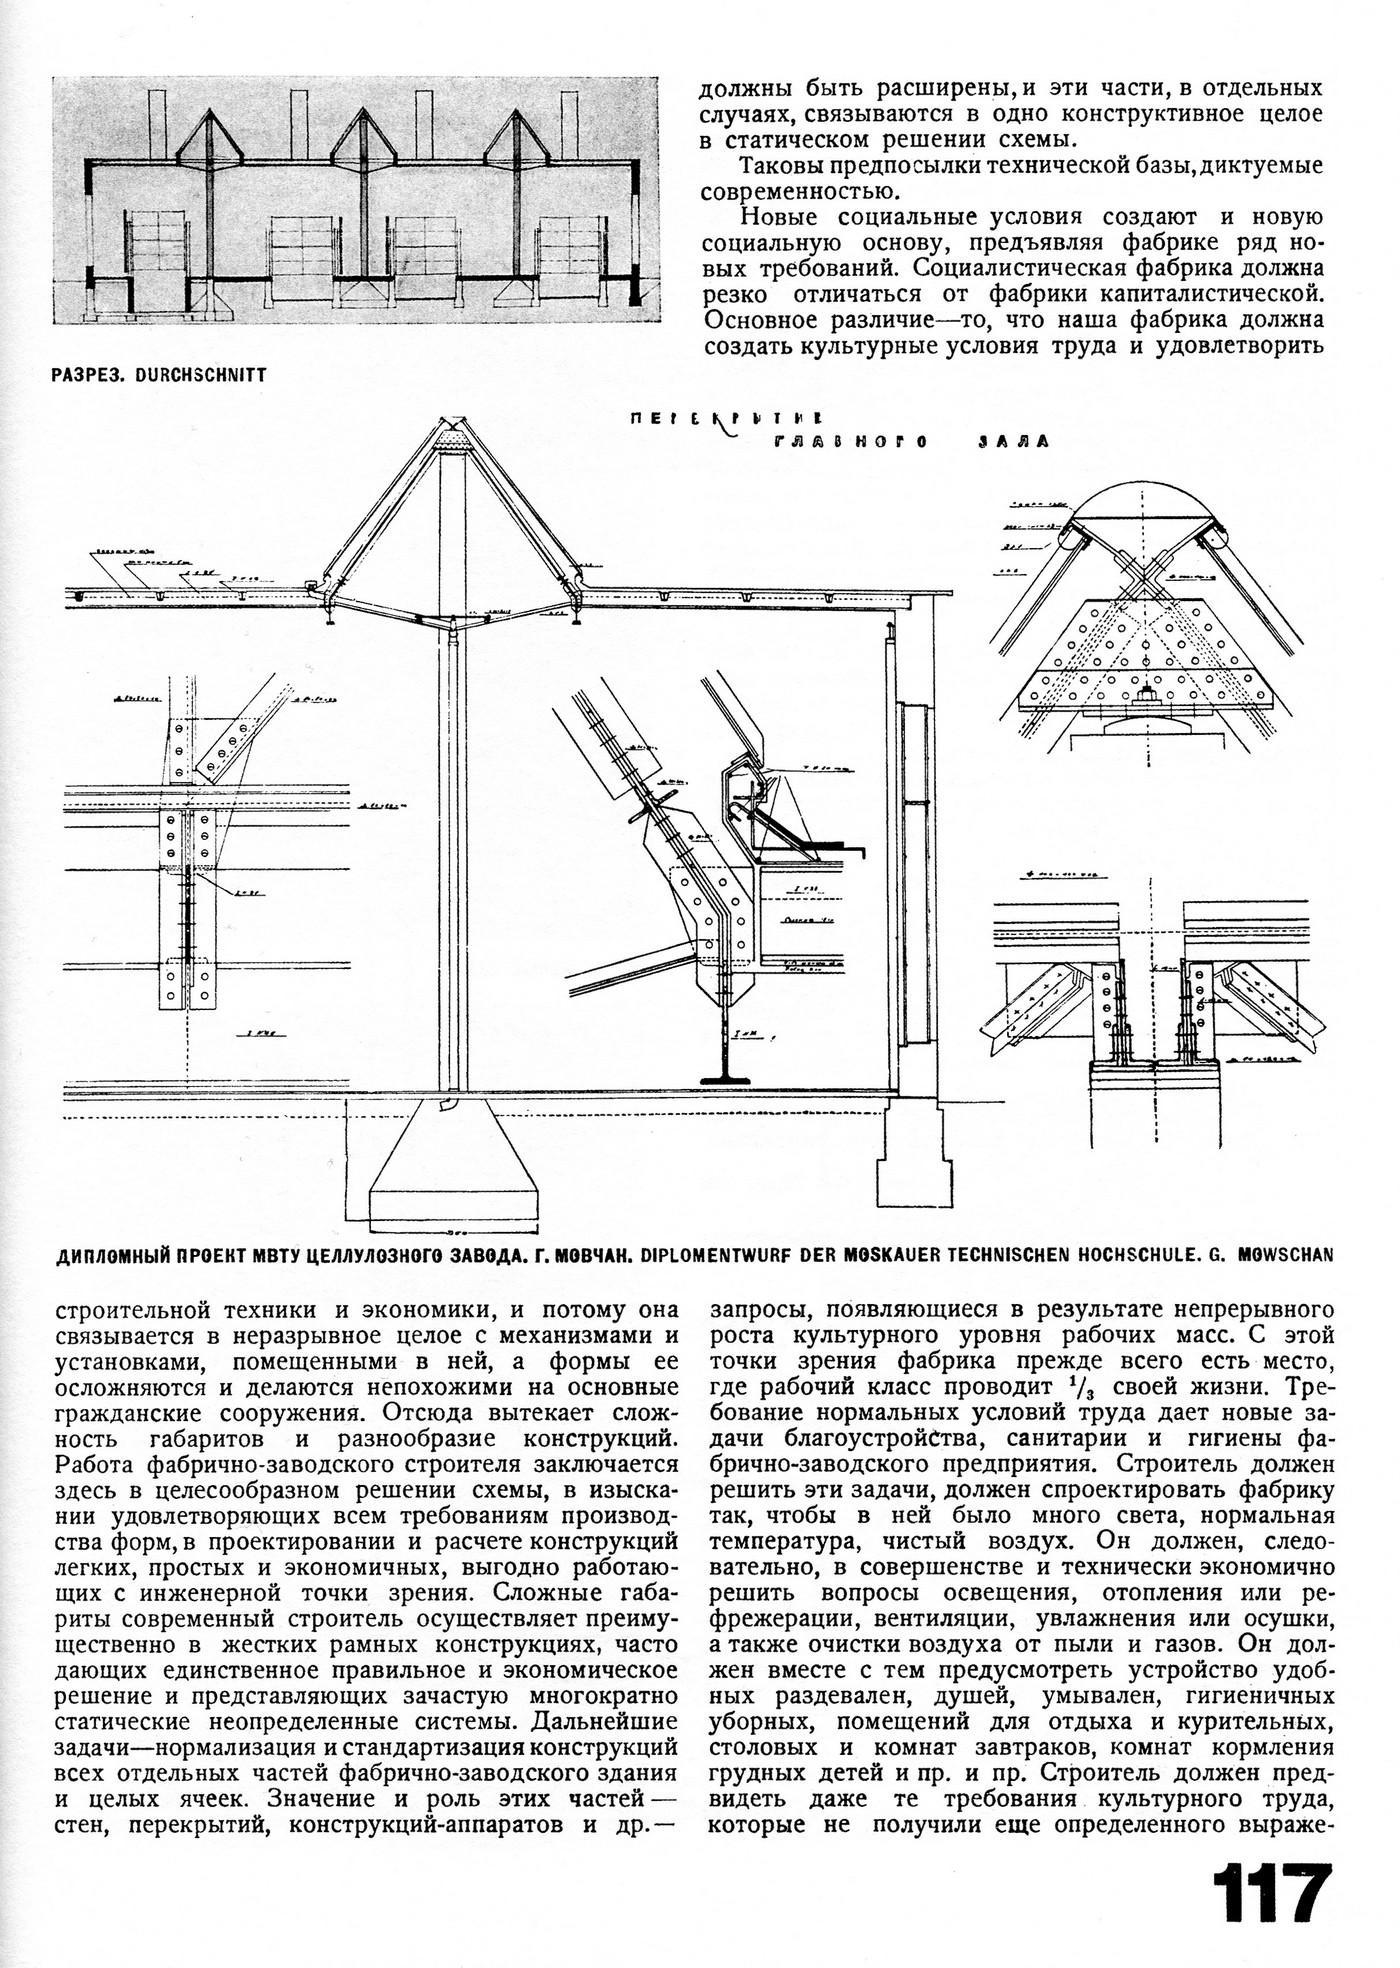 tehne.com-sa-1926-5-6-1400-0009